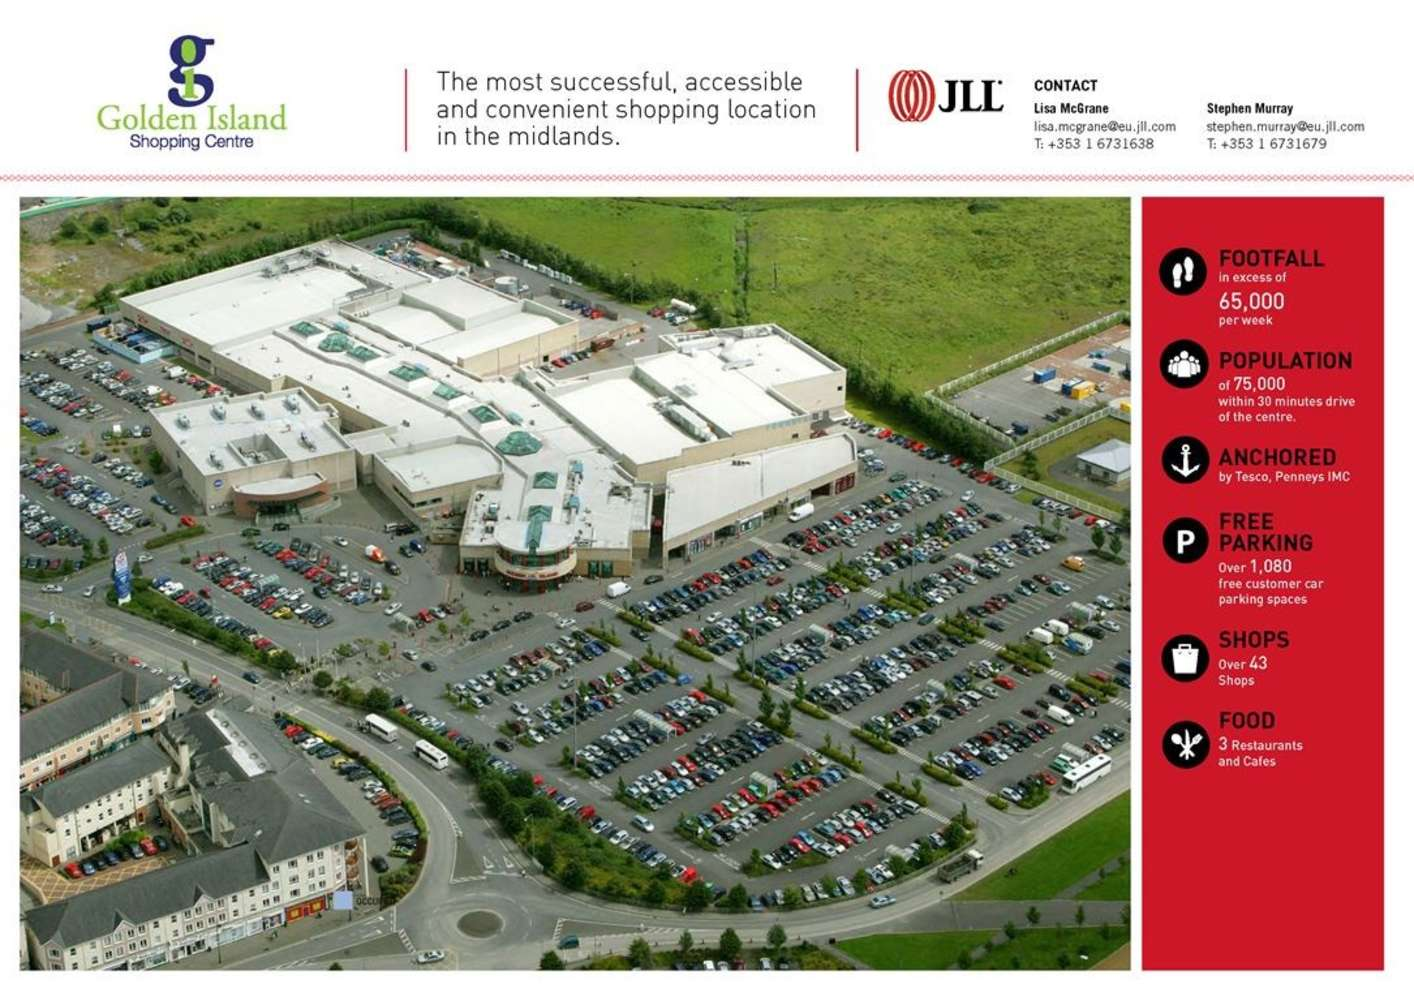 Retail Co westmeath, N37 YK09 - Unit 36 Golden Island Shopping Centre